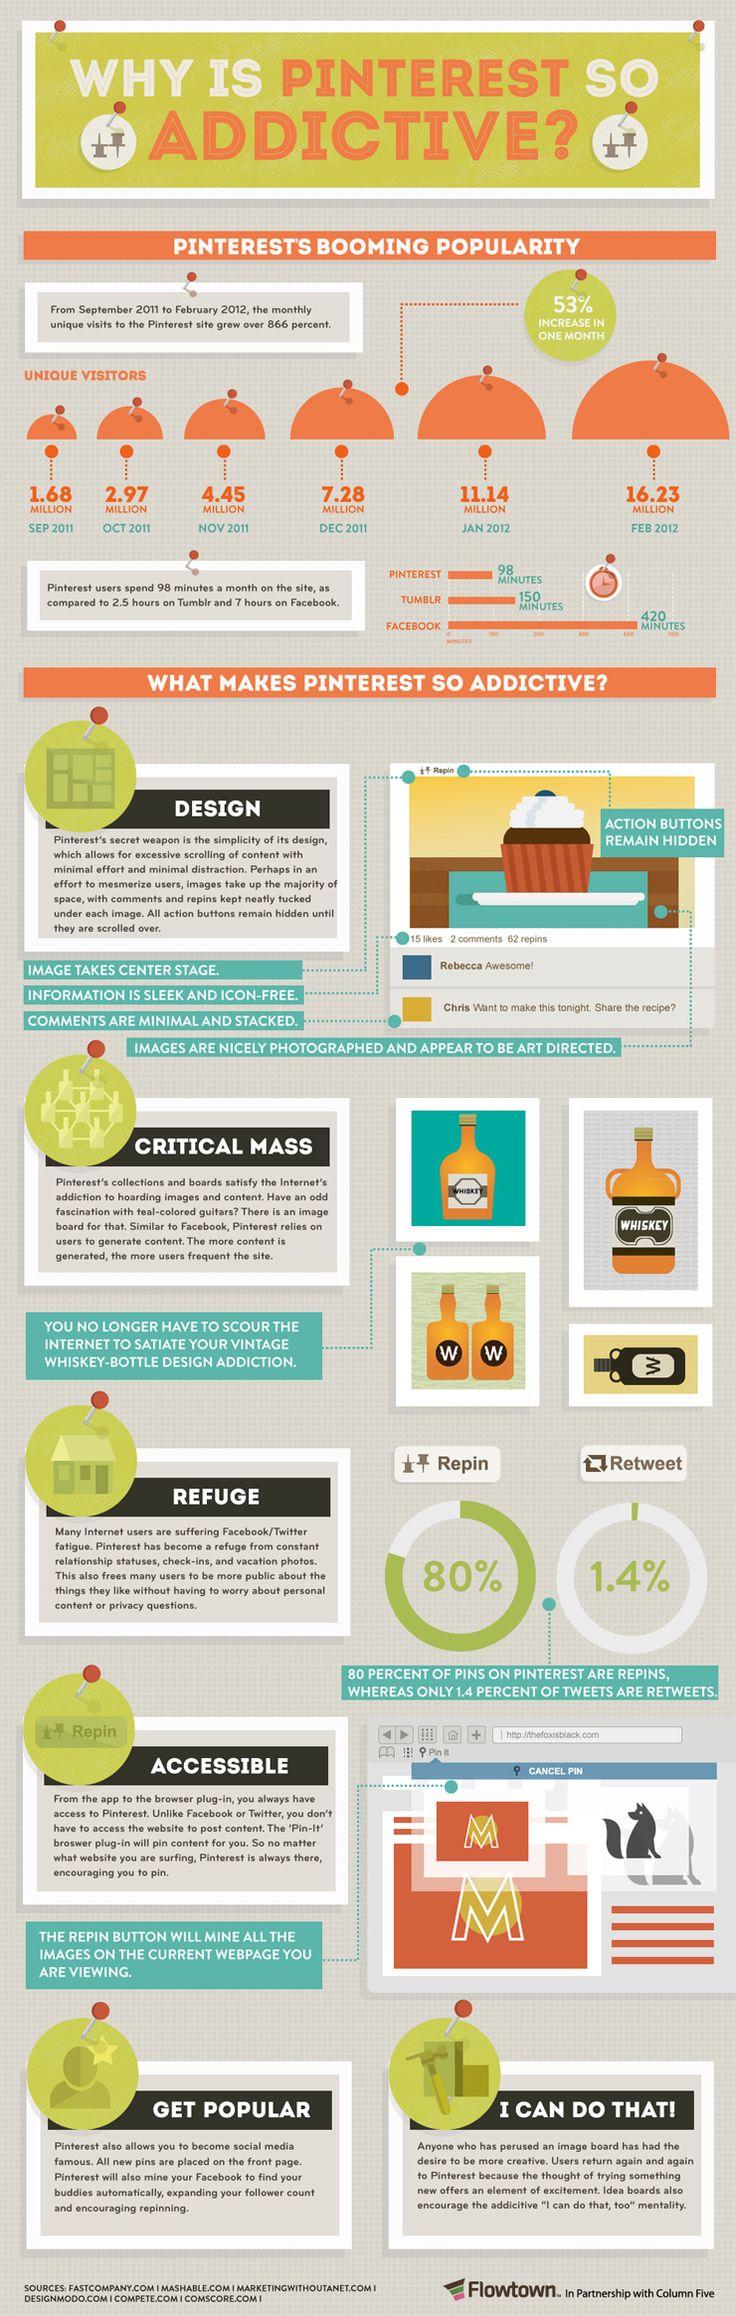 Why Is Pinterest So Addictive? #Infographic #SocialMedia #Pinterest